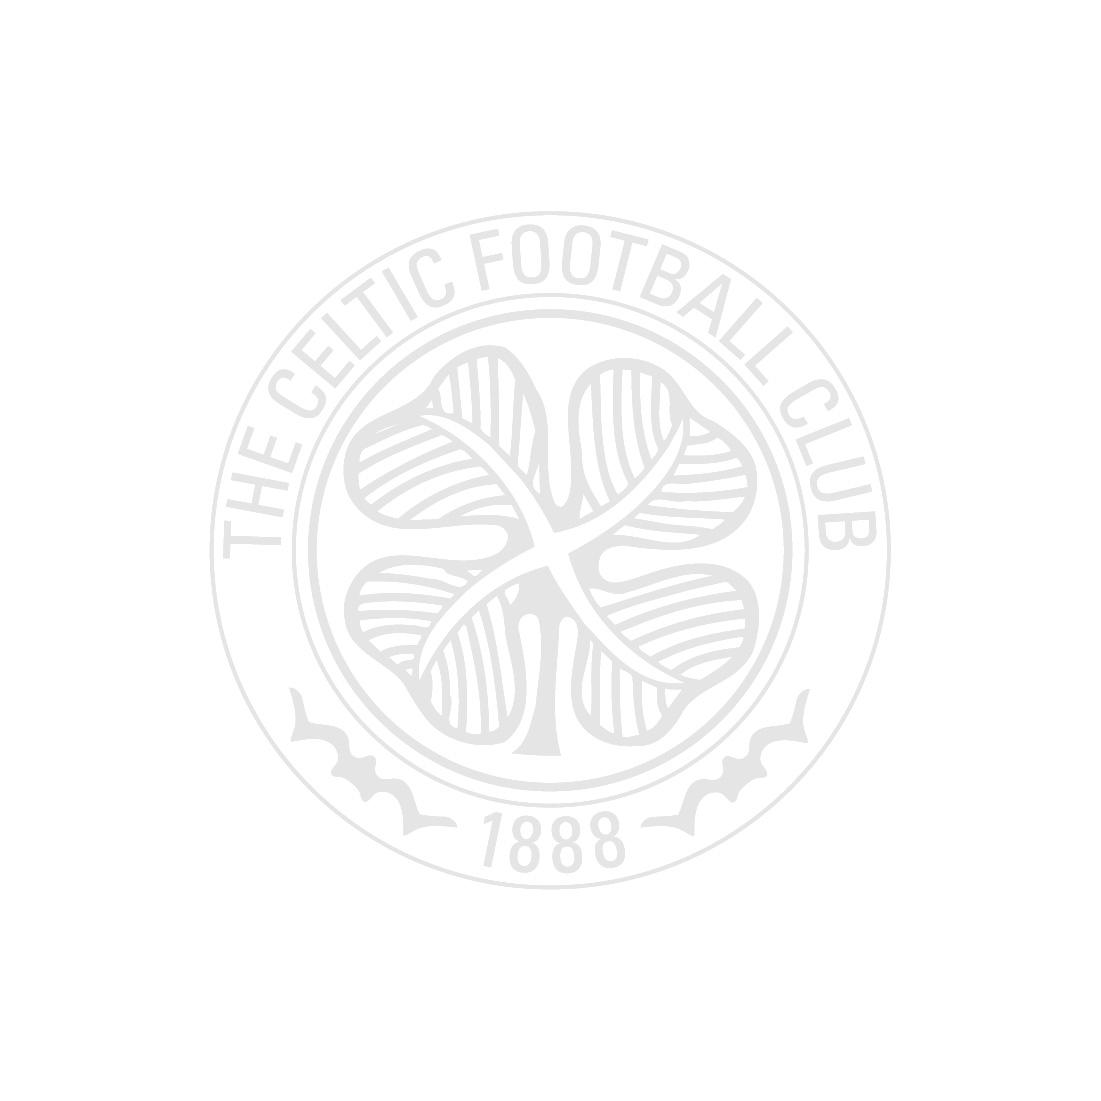 Celtic Last Minute Heroes DVD